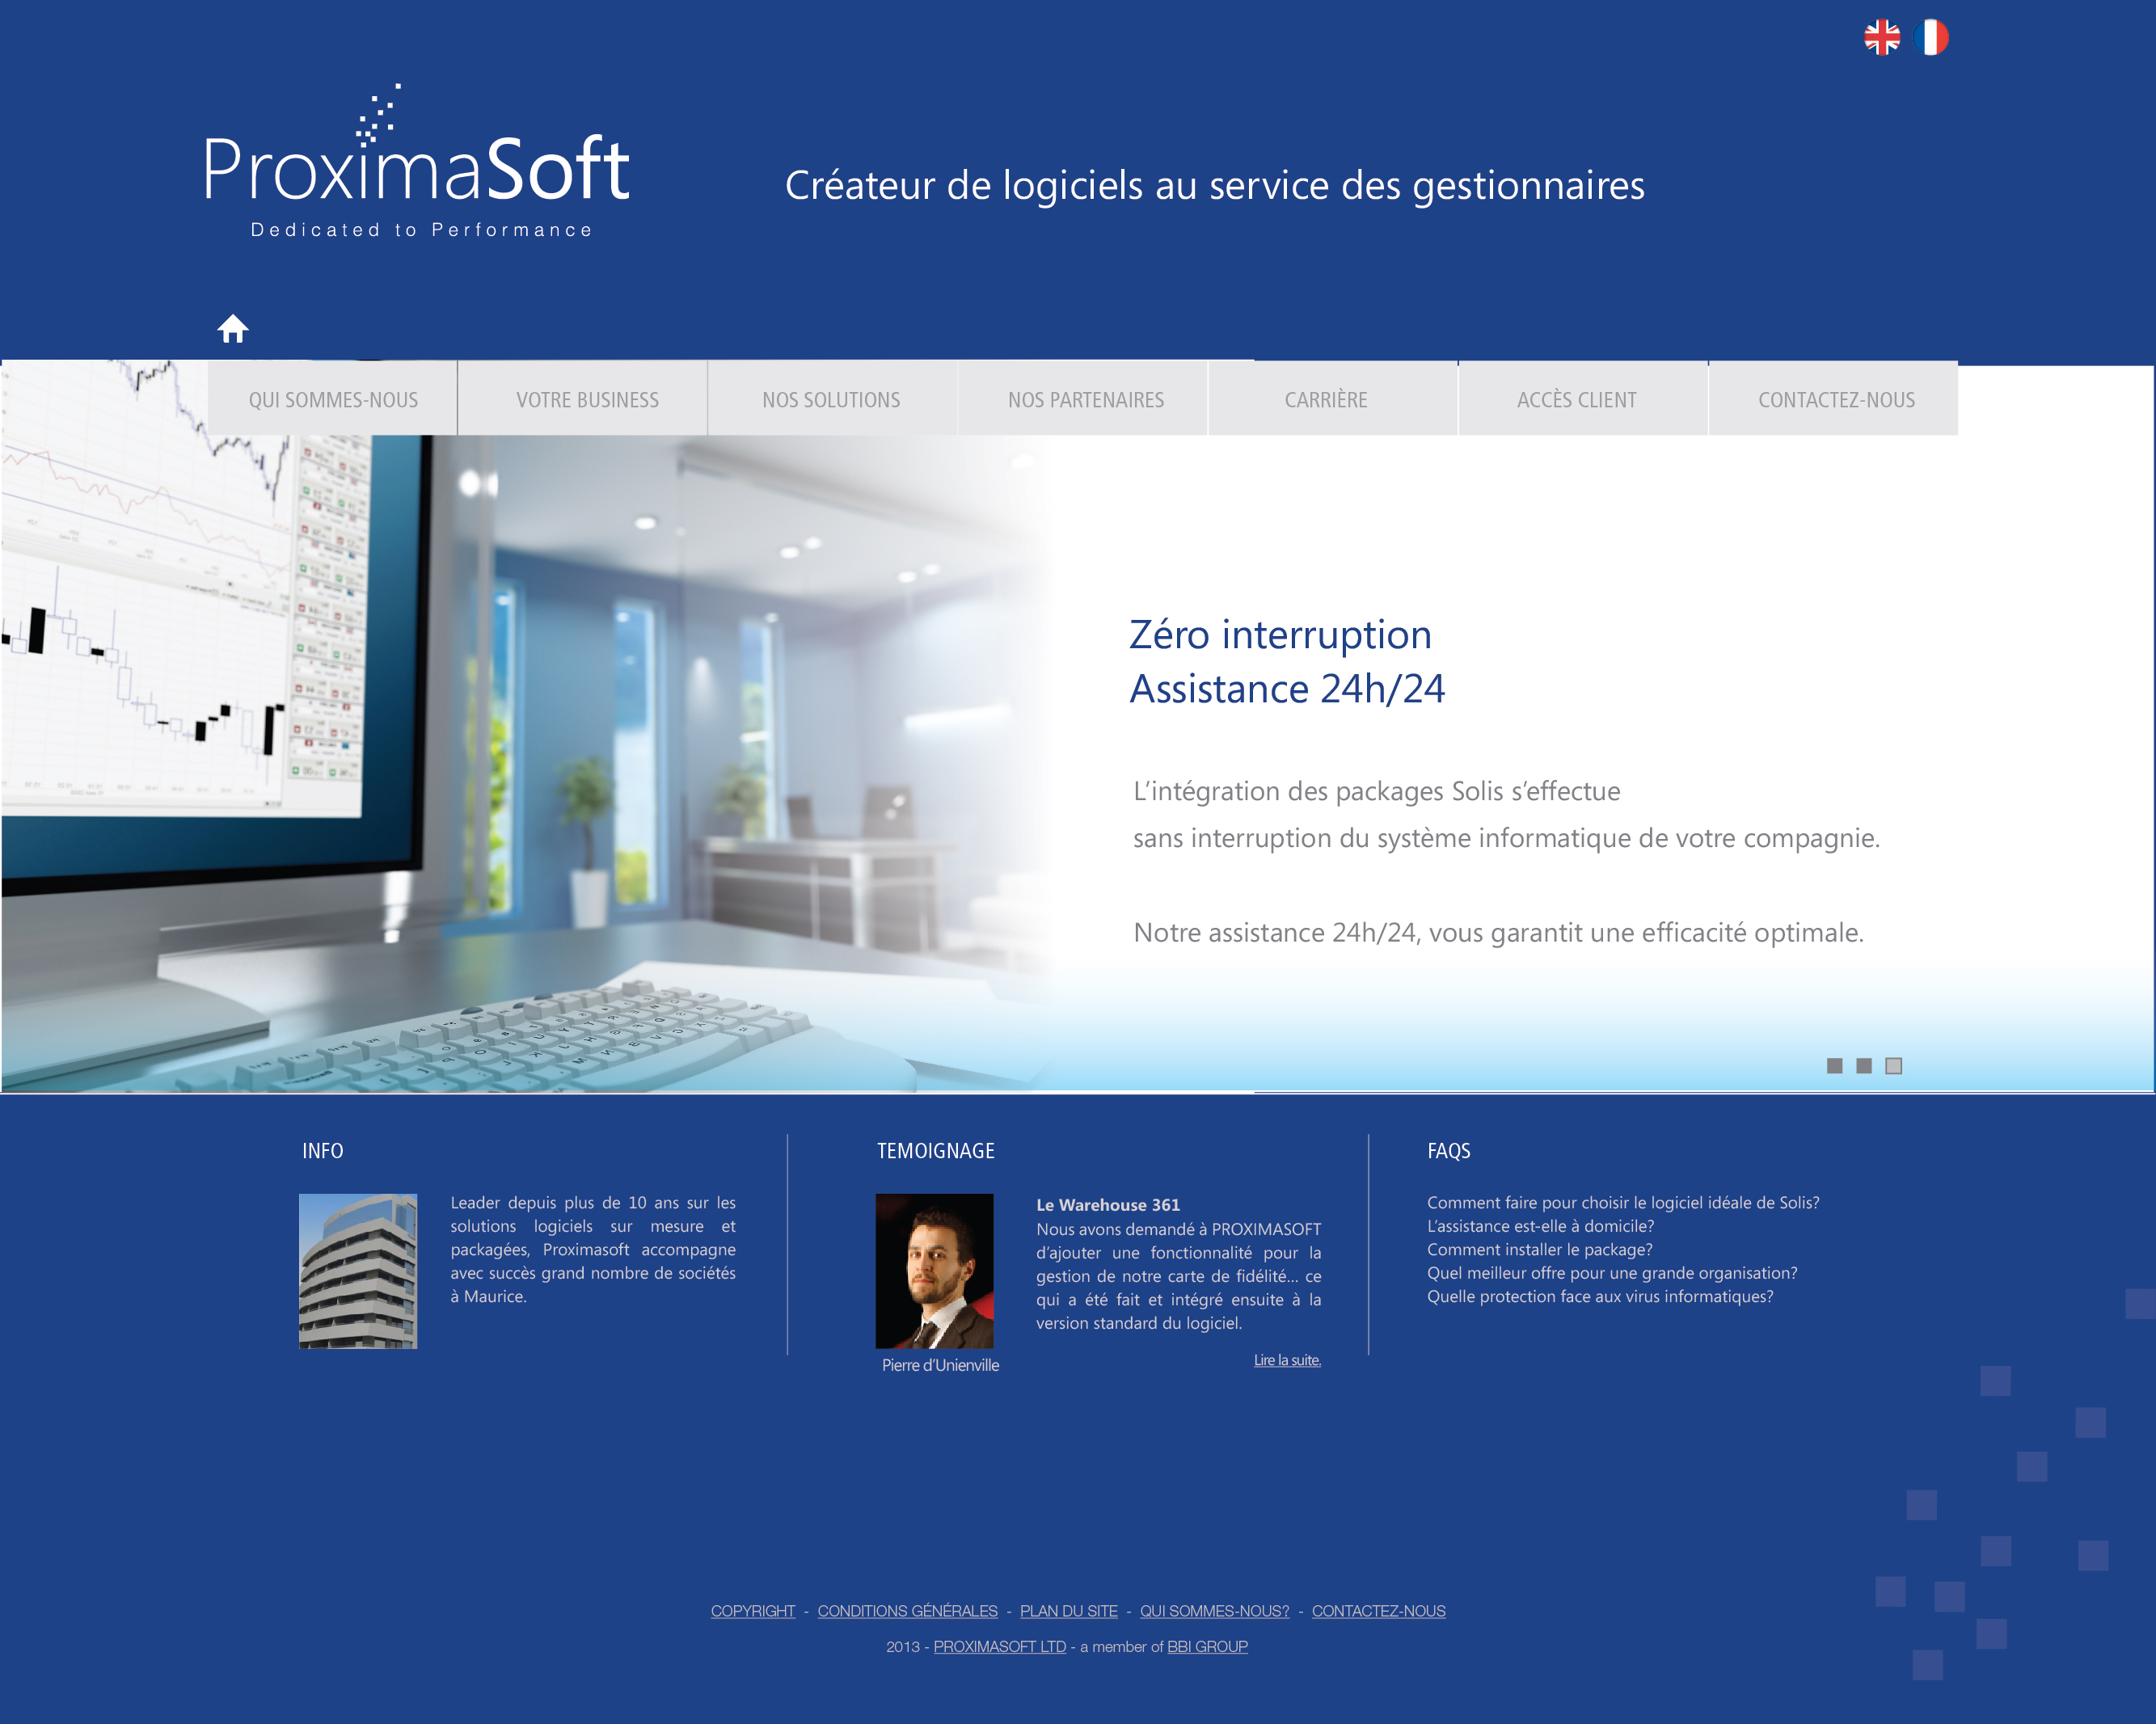 ProximaSoft